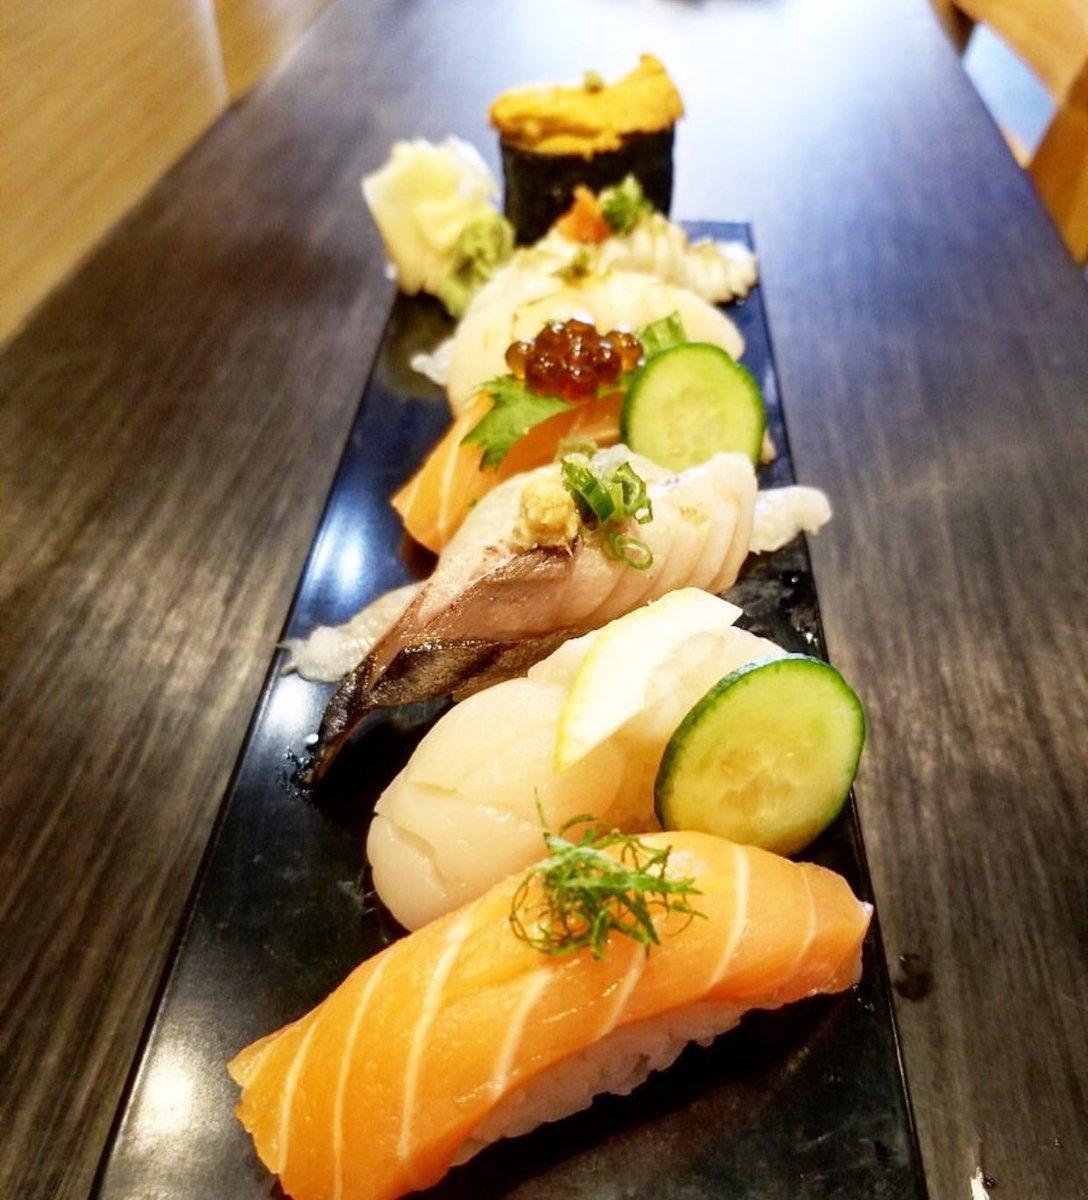 Sushi 🍣 #bishamon #bishamonrestaurant #bishamonkaraoke #bishamonsportsbar #japan #japanese #japaneserestaurant #japanesebar #sake #beer #asahi #kirin #sapporo #bishamonsake #covina #california #downtowncovina #la #foodie #food #drink #party #eat #karaoke #bar #instafood #insta